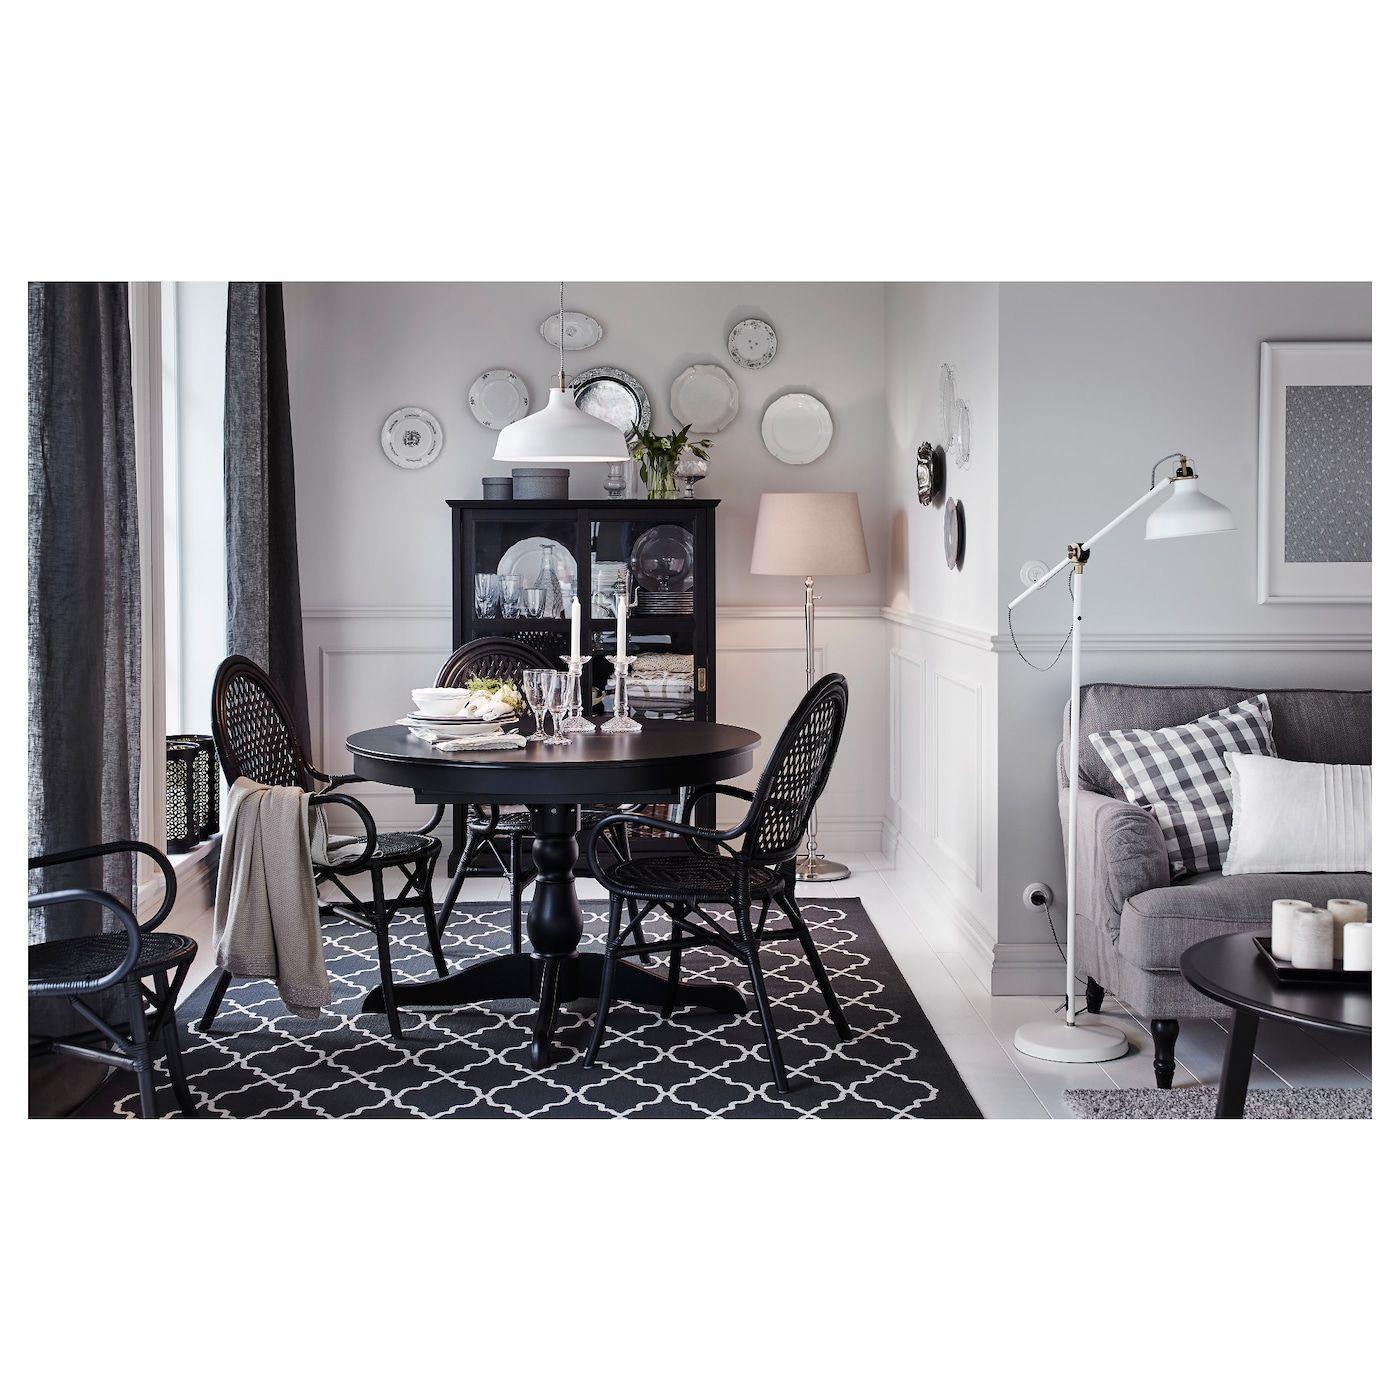 Hovslund Rug Low Pile Dark Gray Ikea Black Round Dining Table Dining Room Renovation Ikea